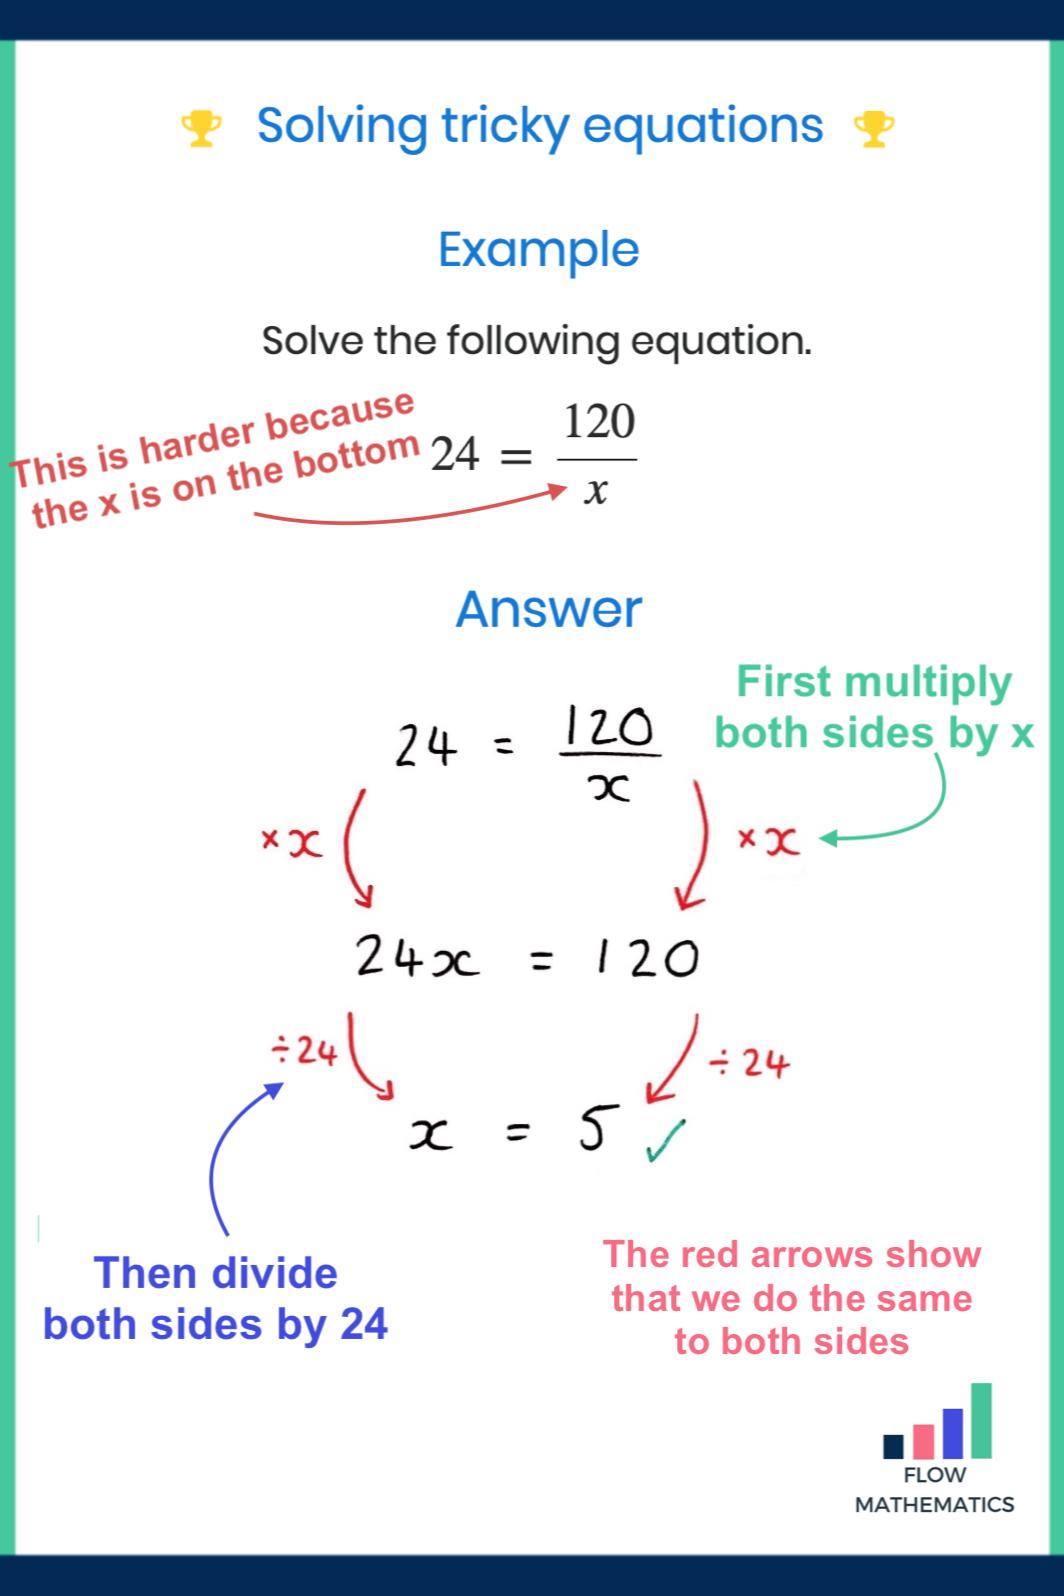 Pin By Mustafa Yeshilishik On Maths In